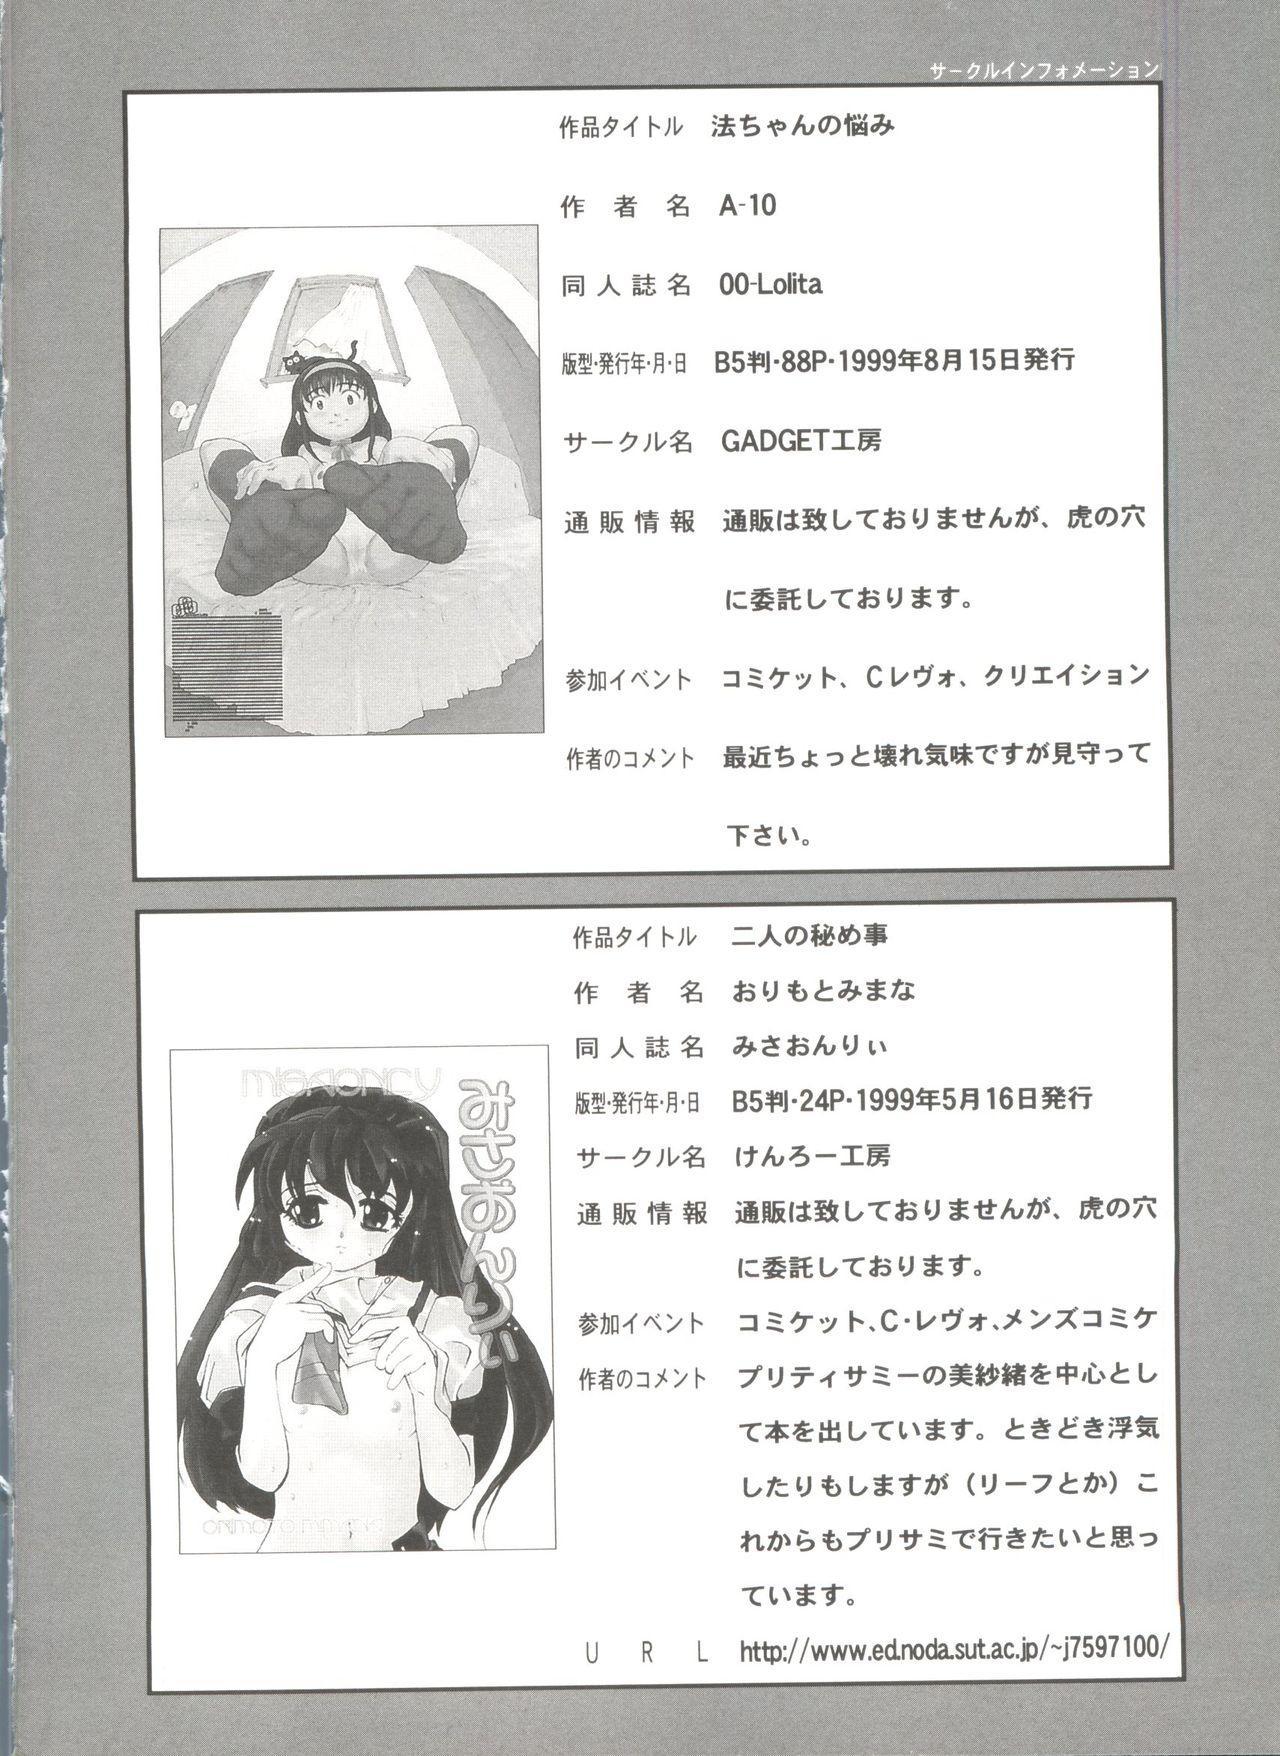 [Anthology] Denei Tamatebako 8 - Utakata no Tenshi-tachi II (Various) 143